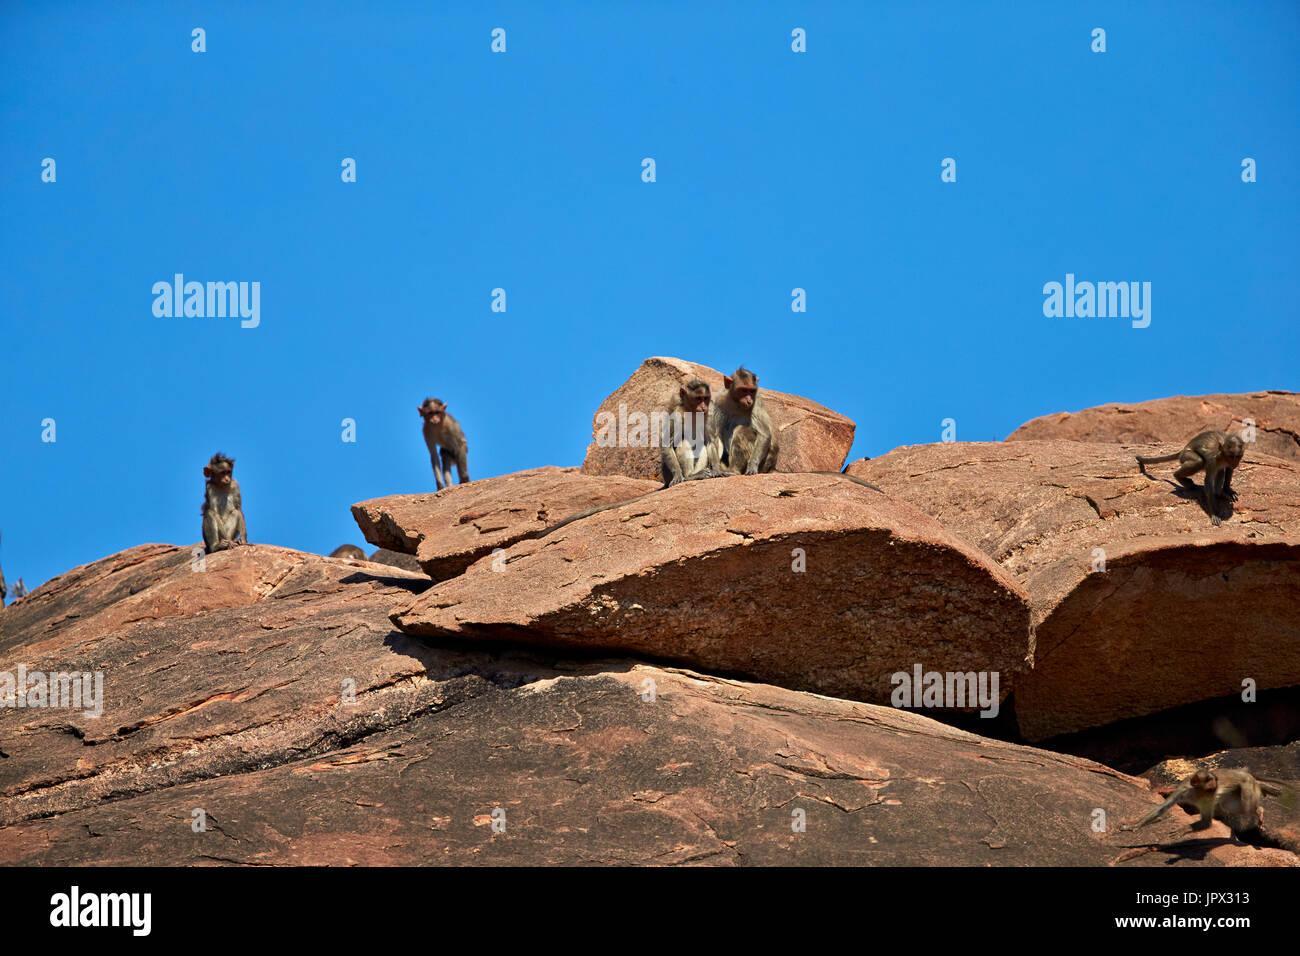 Bonnet Macaques on rock - Mountain Sanduru India - Stock Image